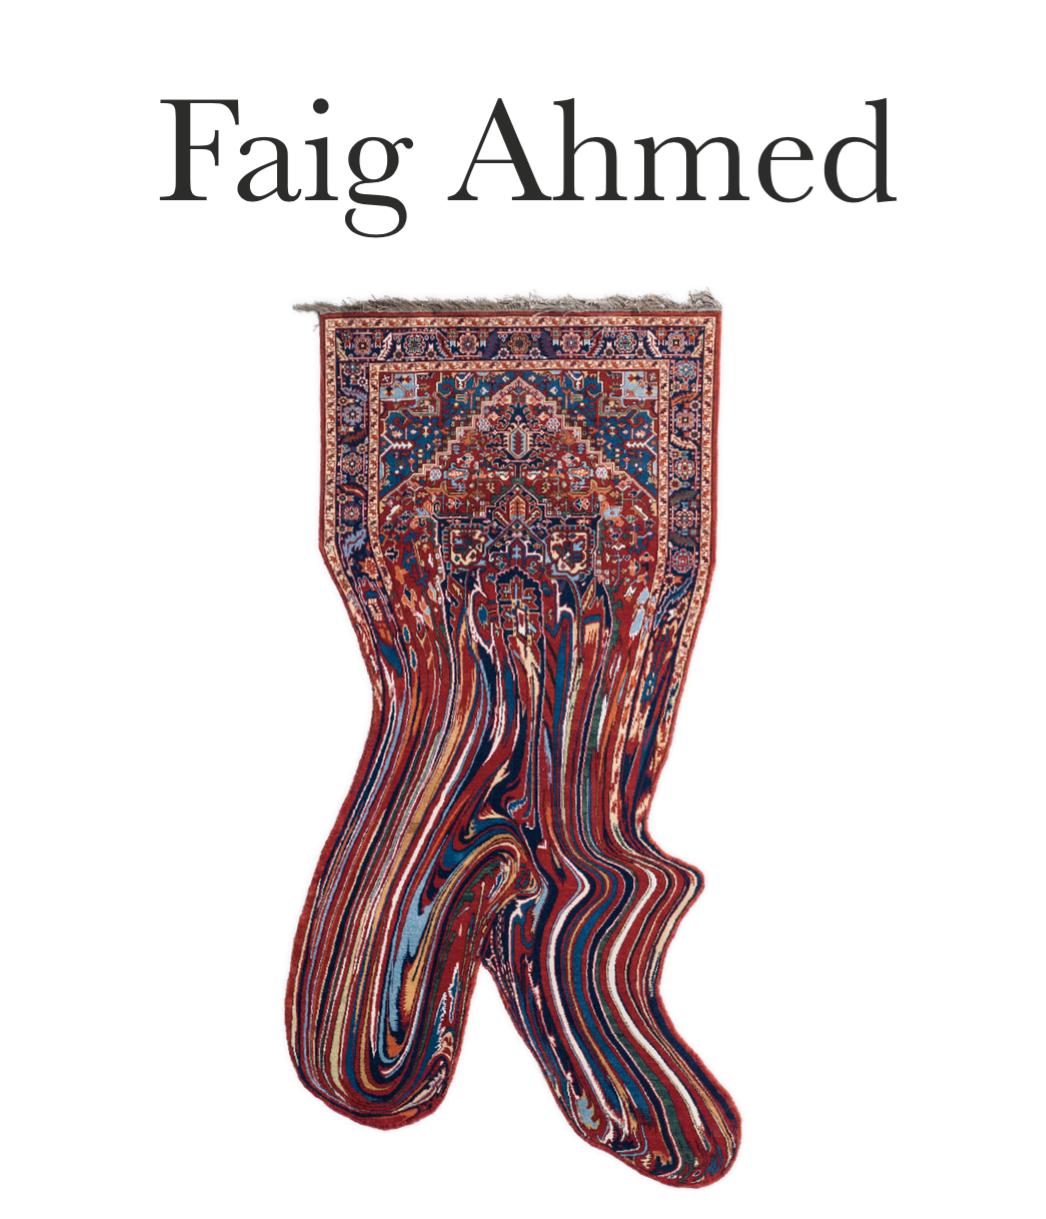 Faig Ahmed gallery card-192514-edited.png